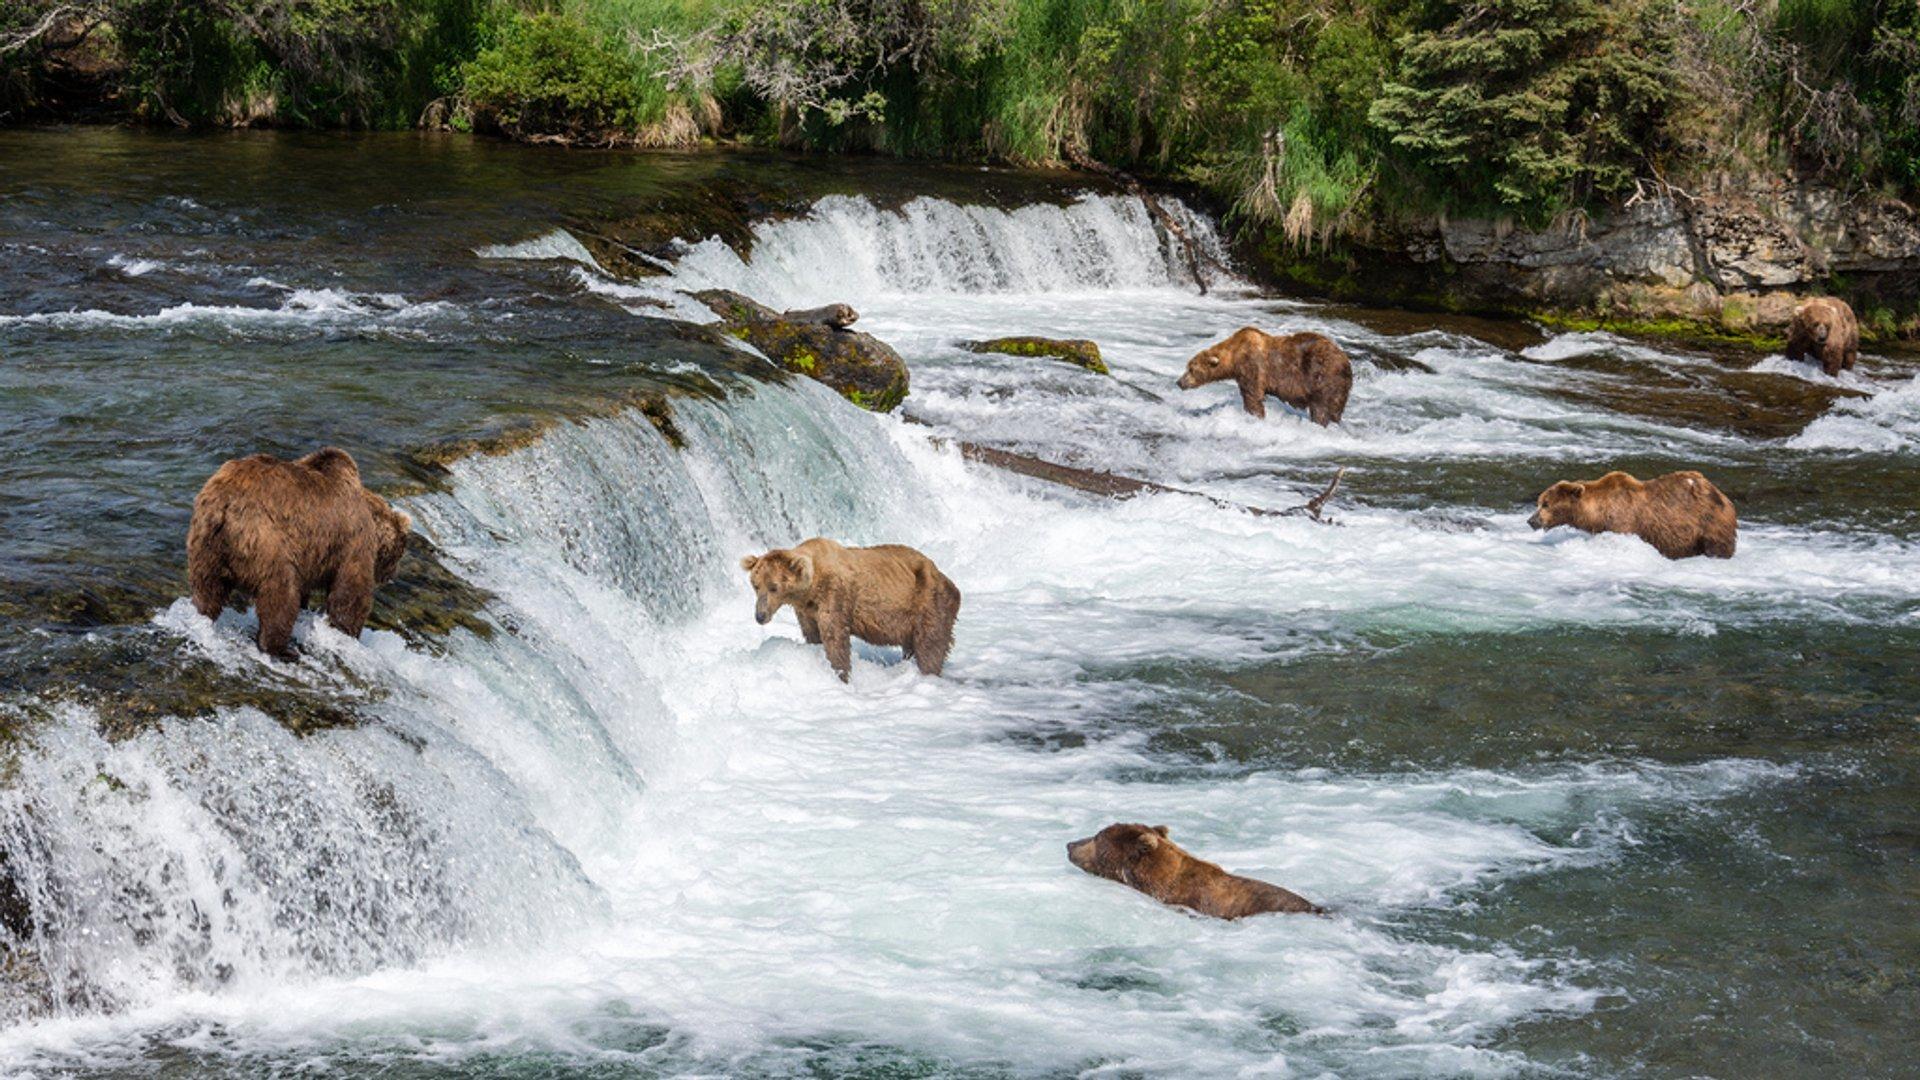 Bear Watching in Alaska 2020 - Best Time